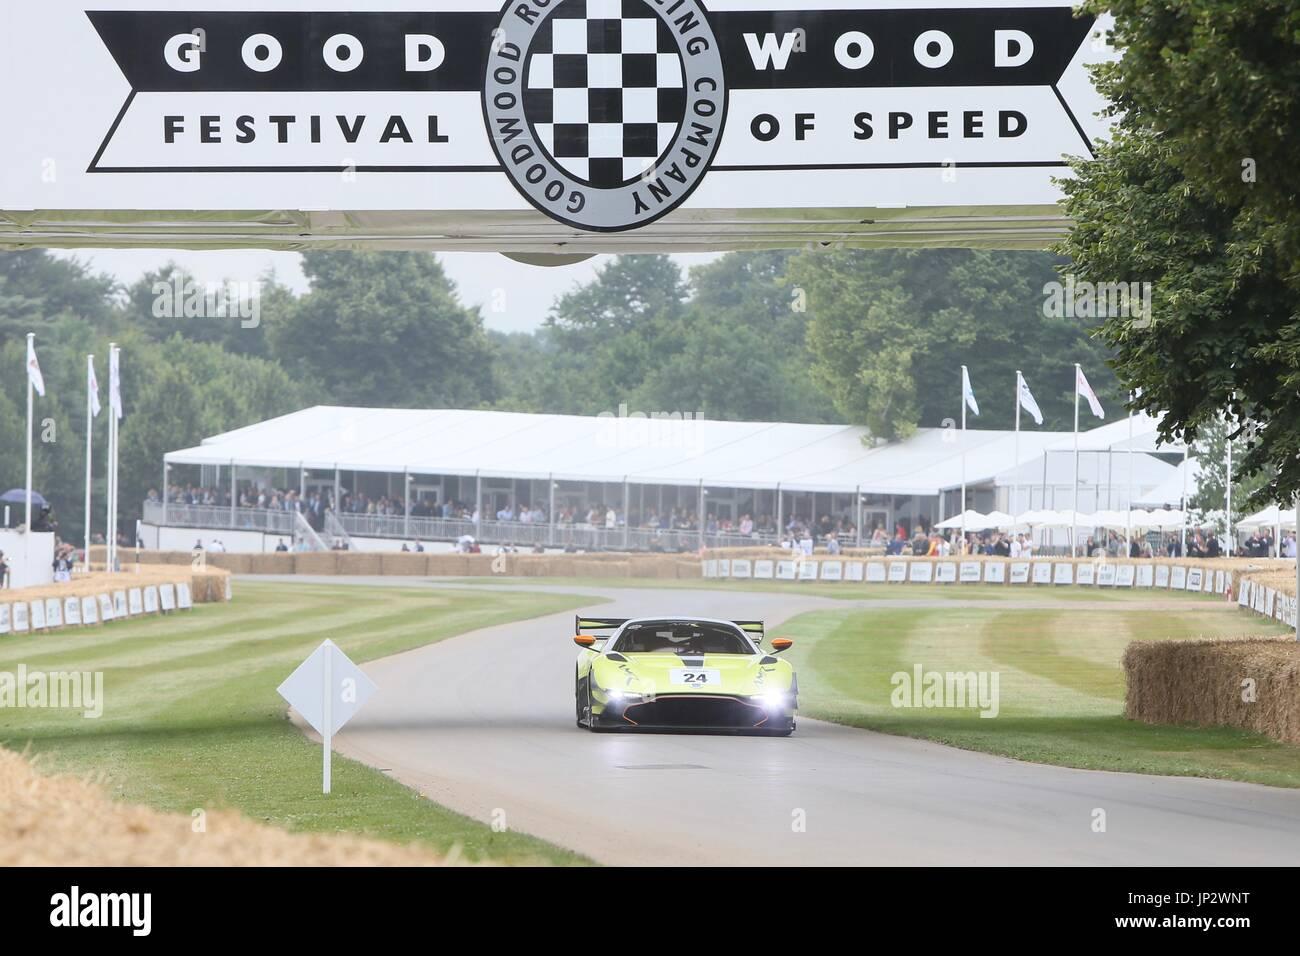 Goodwood Festival of Speed 2017 - Day 1 - Goodwood Hillclimb  Featuring: Aston Martin Vulcan Where: Chichester, United Kingdom When: 29 Jun 2017 Credit: Michael Wright/WENN.com - Stock Image